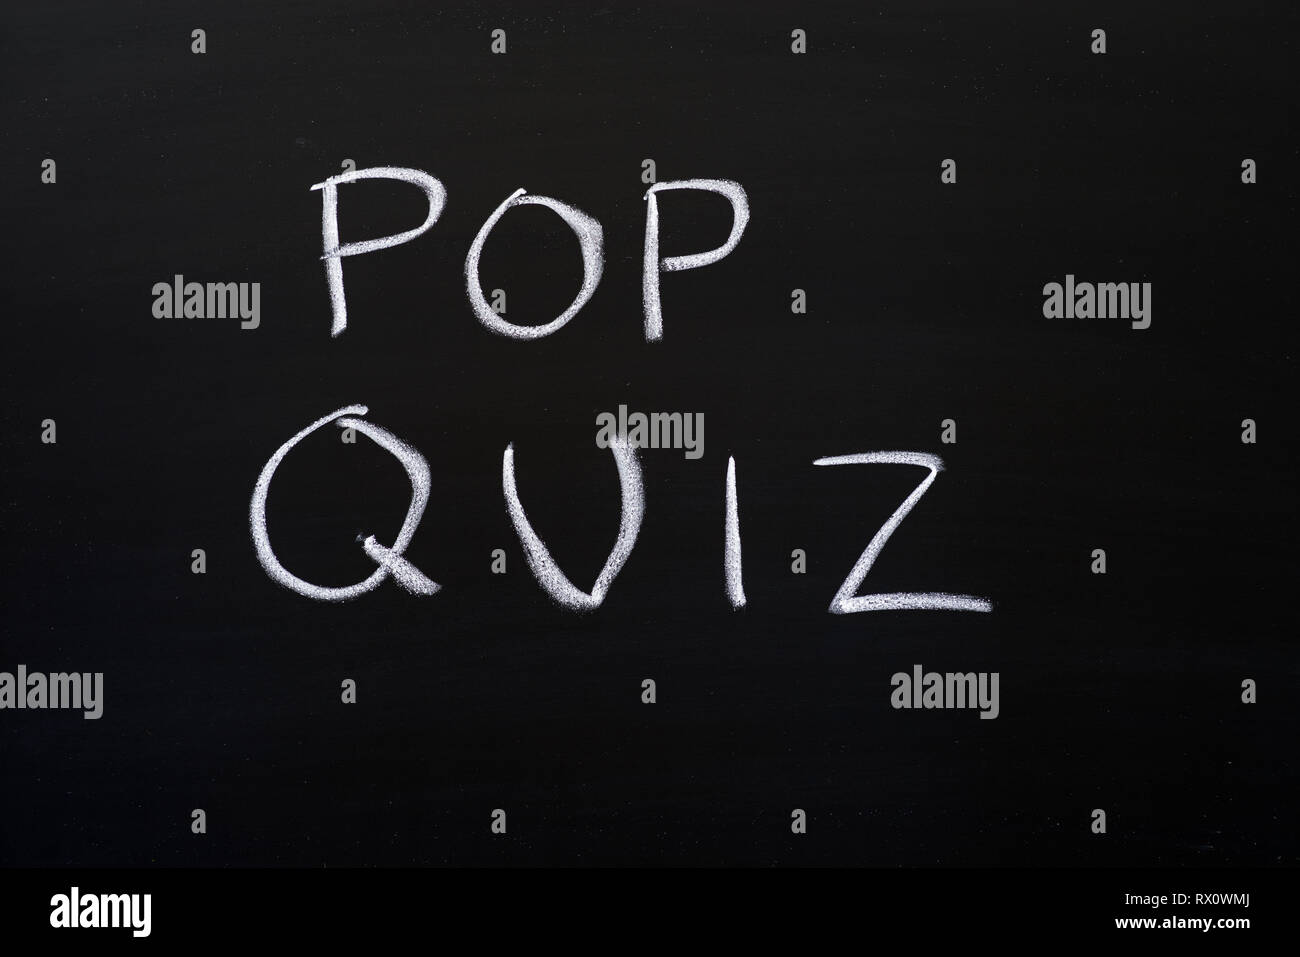 pop quiz written on a blackboard with white chalk - Stock Image